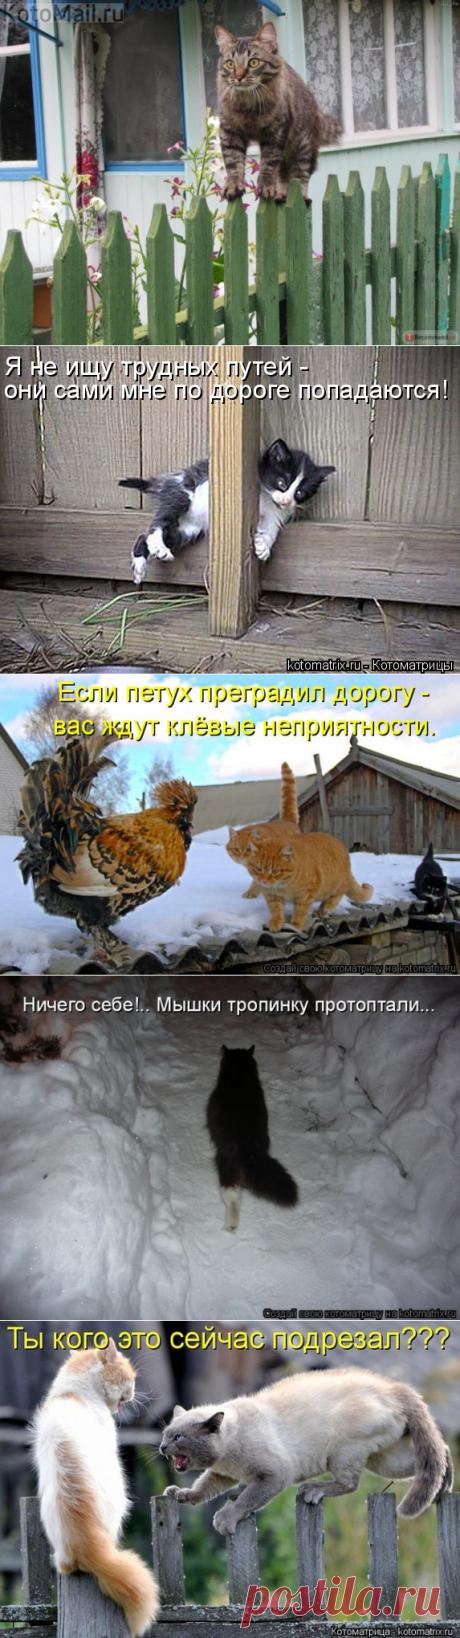 Штакетная тропа | KotoMail.ru